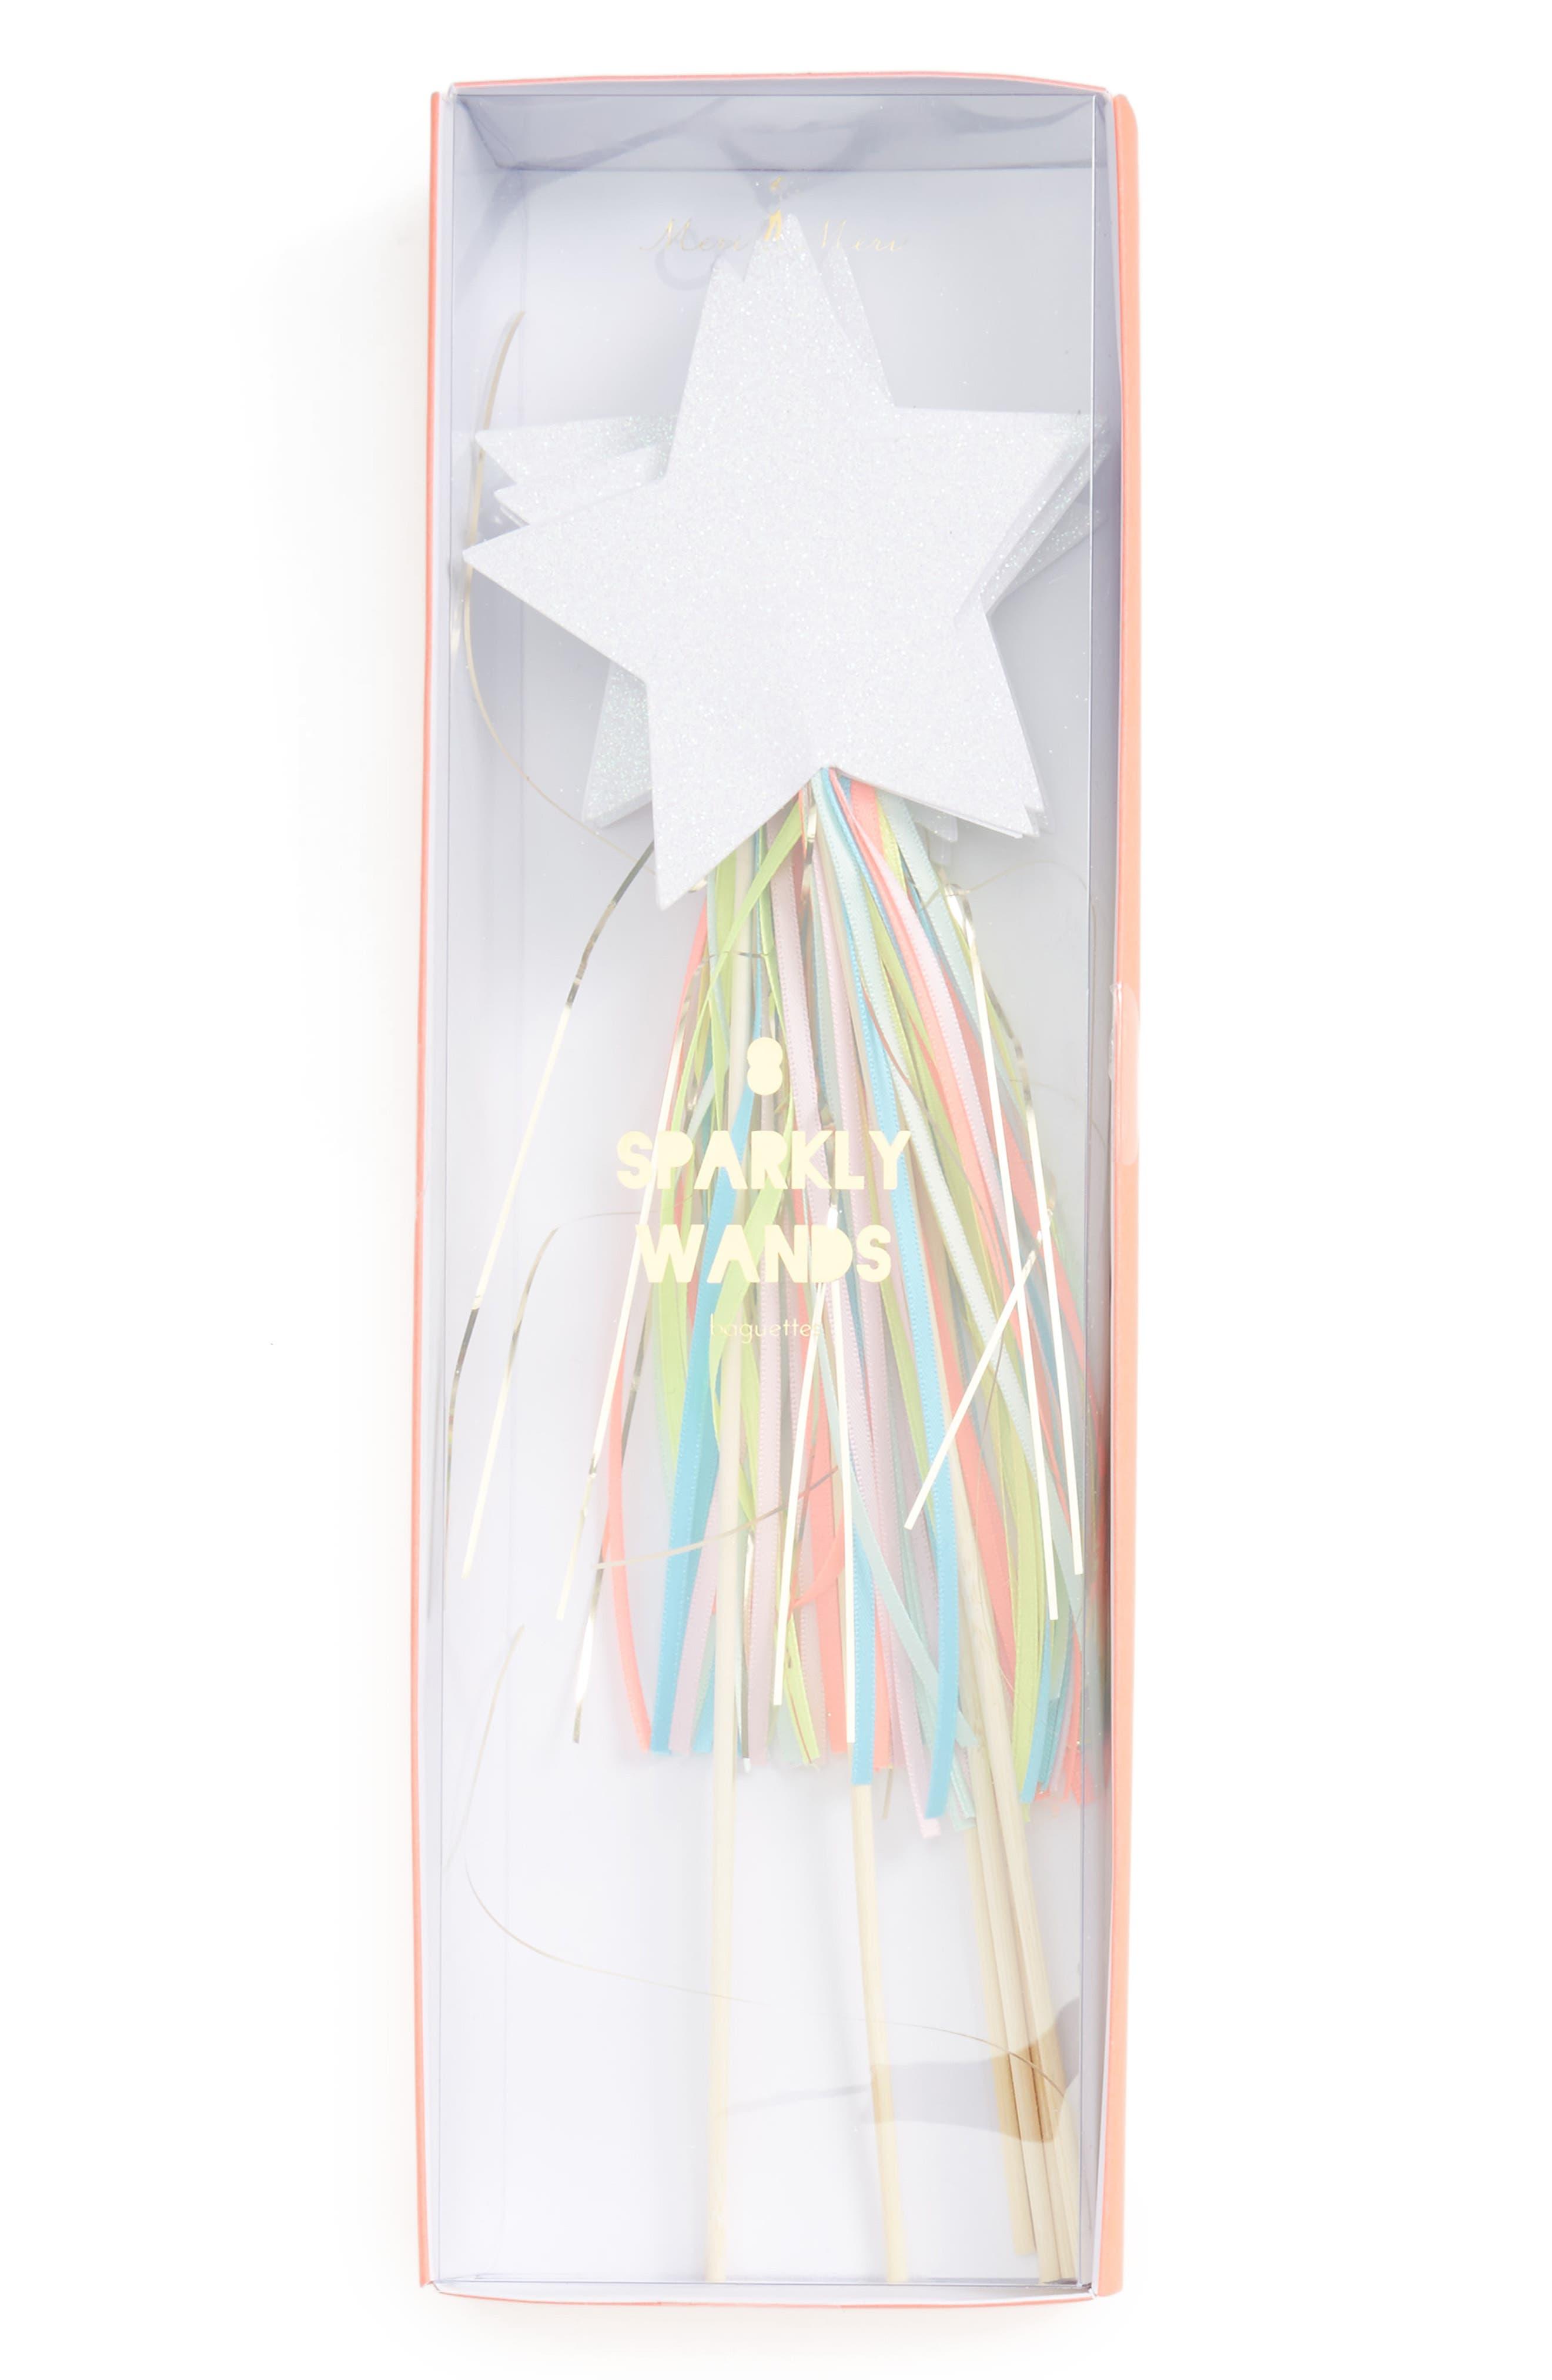 Main Image - Meri Meri Set of 8 Sparkly Wands (Girls)